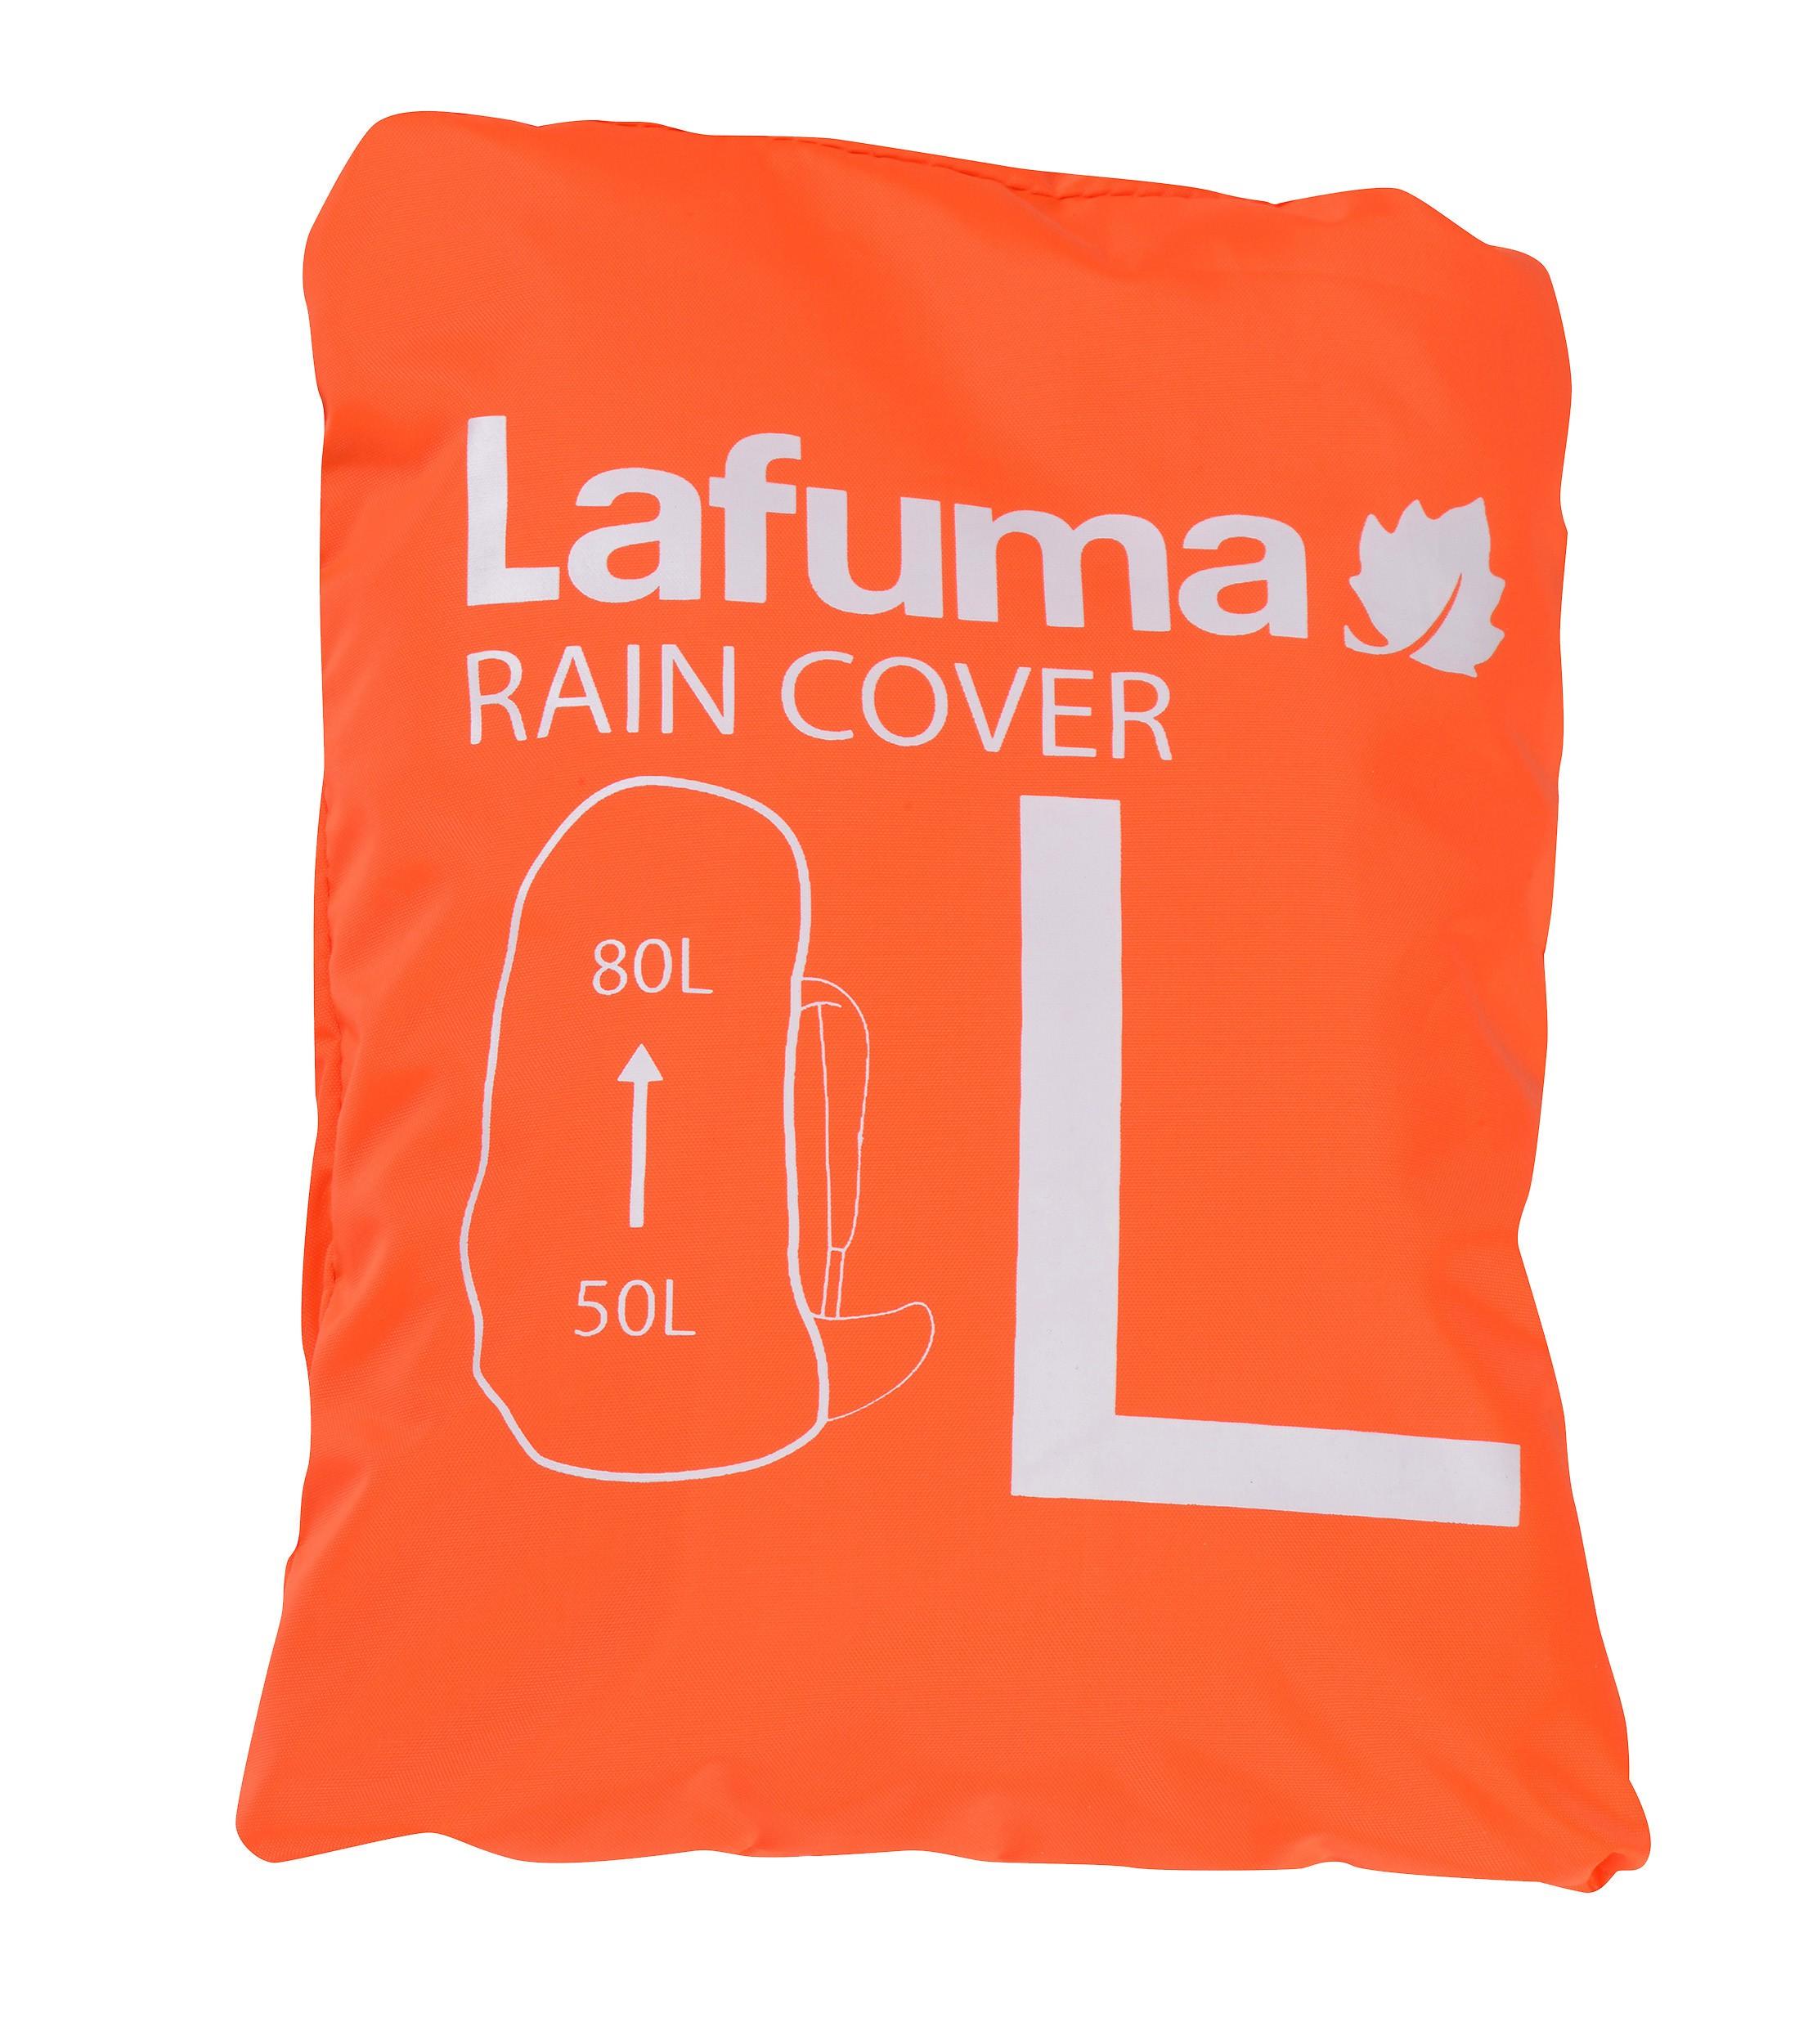 Lafuma Rain Cover - Taille L (50-80L) - Protection pluie